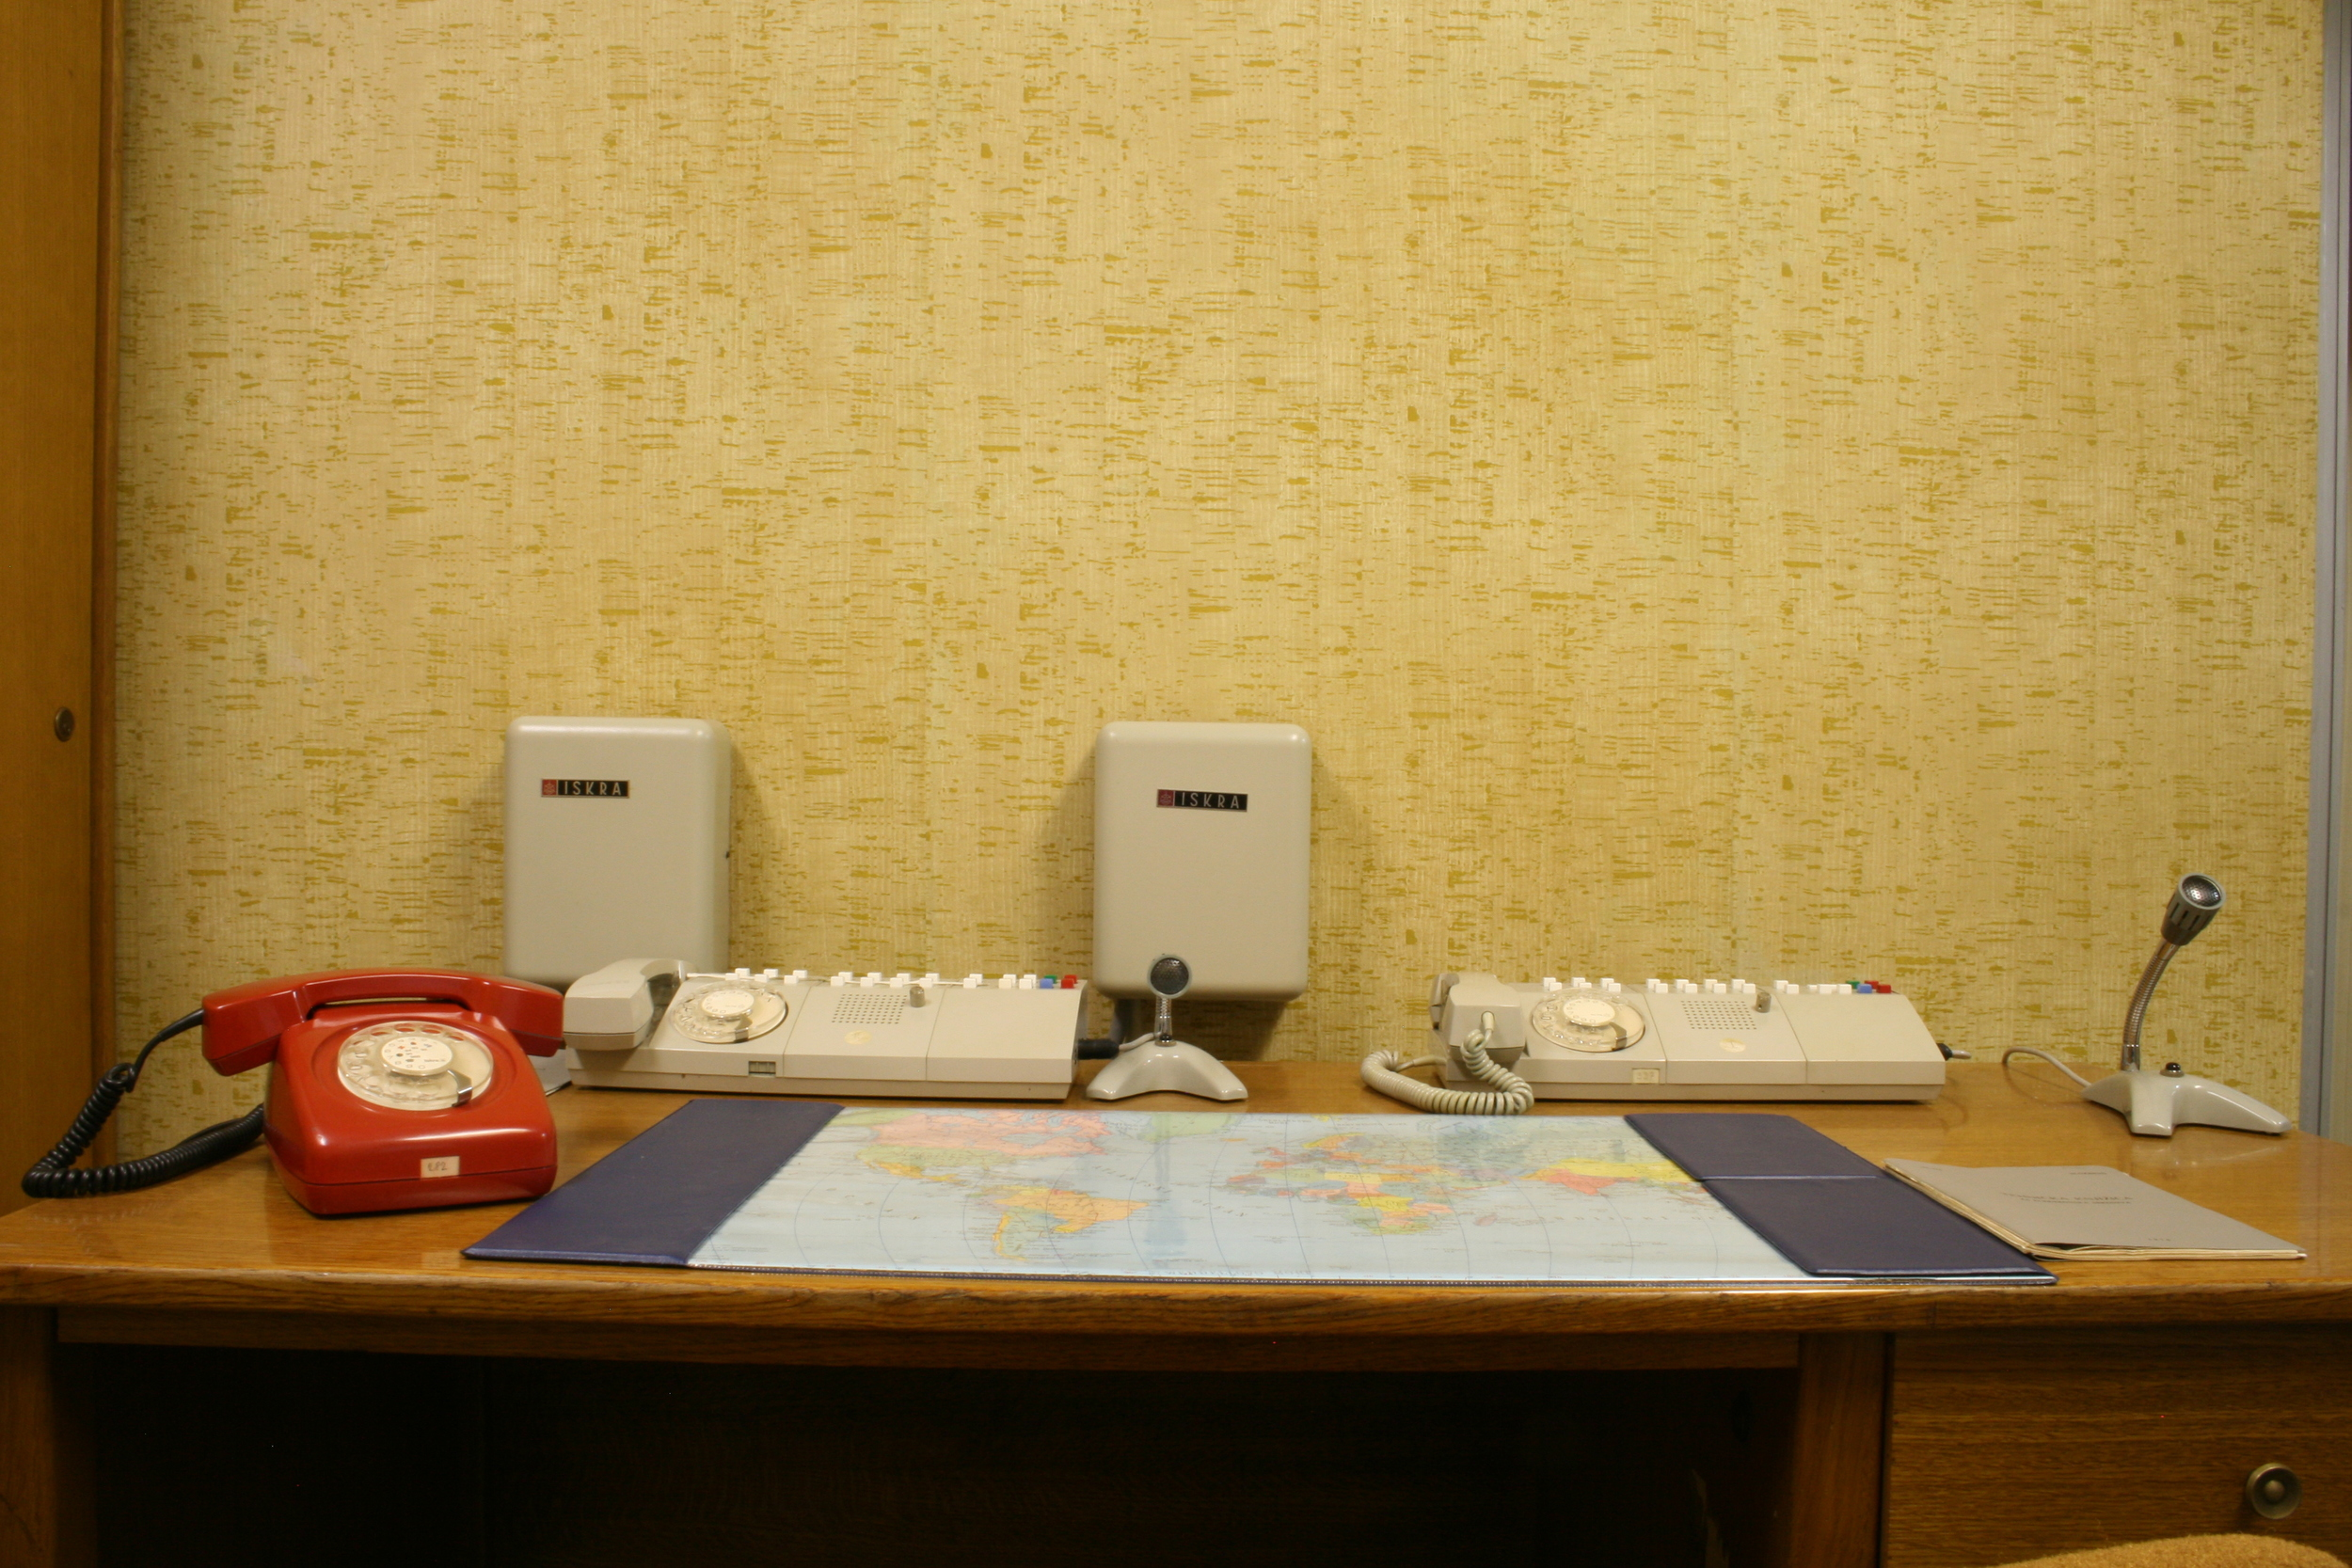 01tito secretary desk frontal 1.JPG